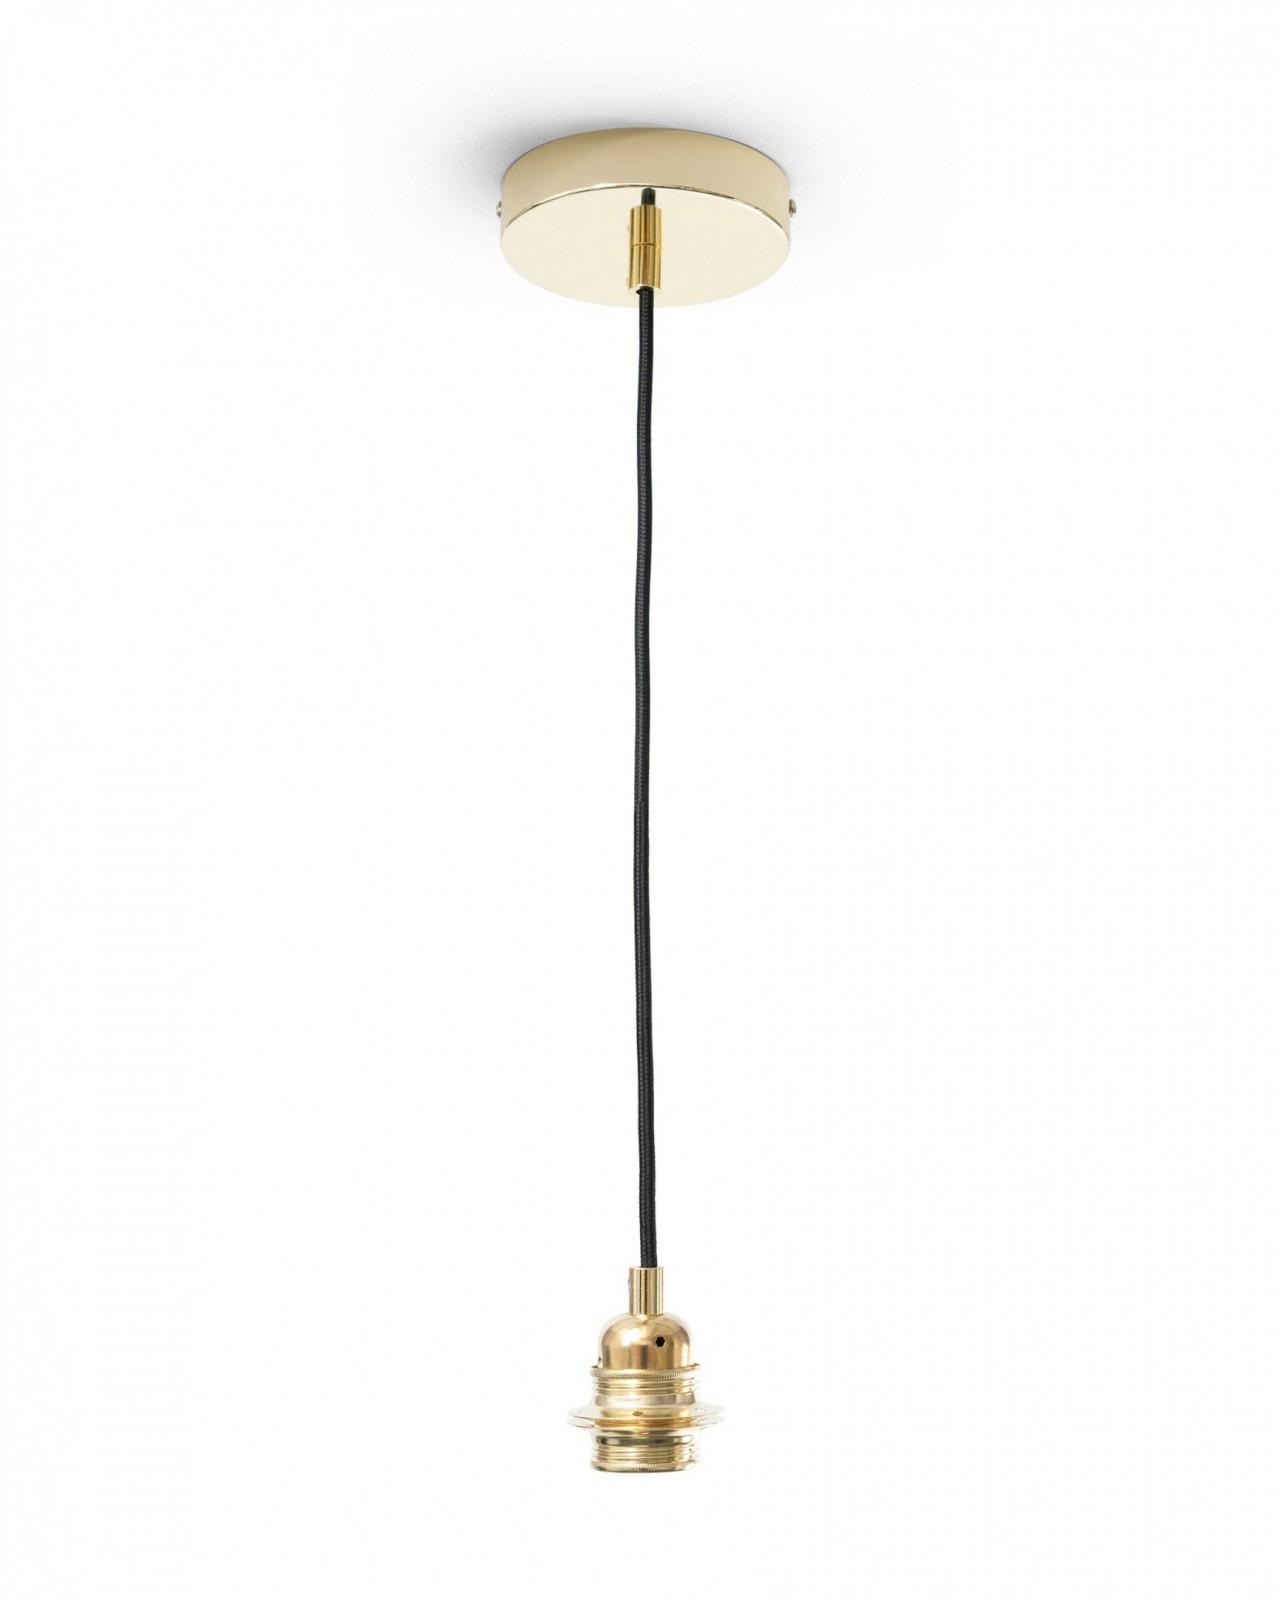 NEPTUNE'S DREAM Pendant Lamp